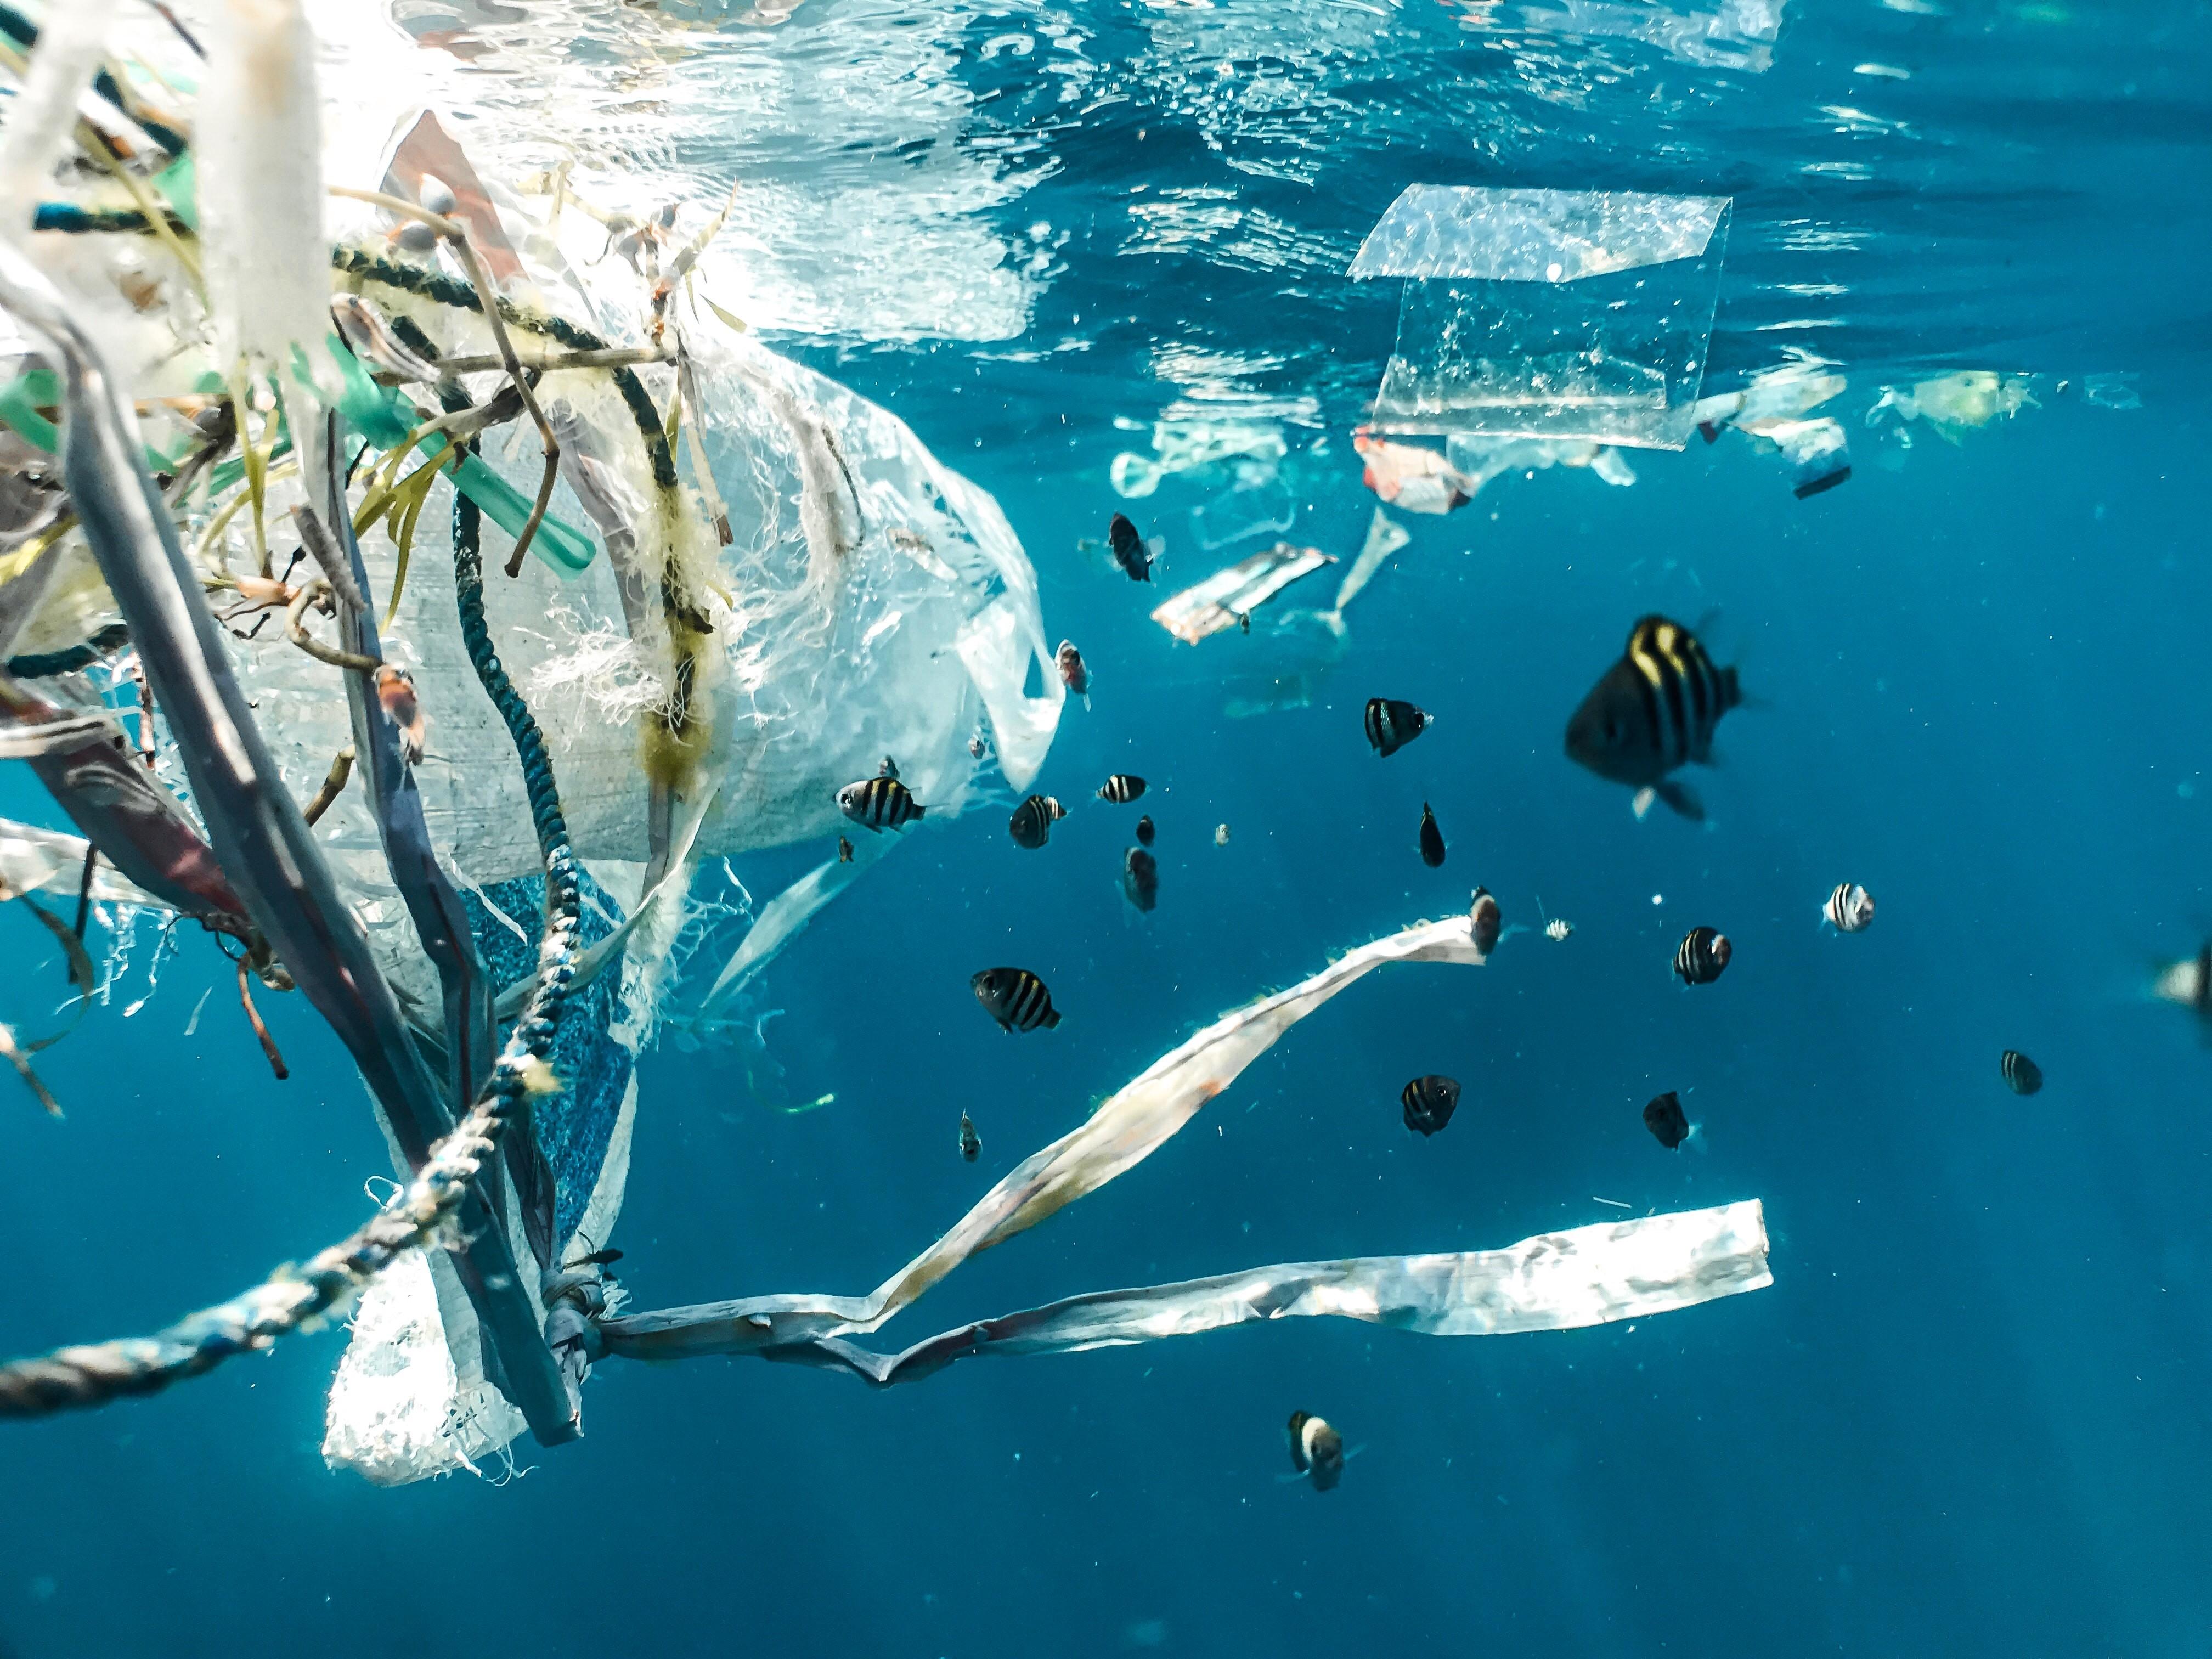 plástico no mar (Foto: Naja Bertolt Jensen via Unsplash)